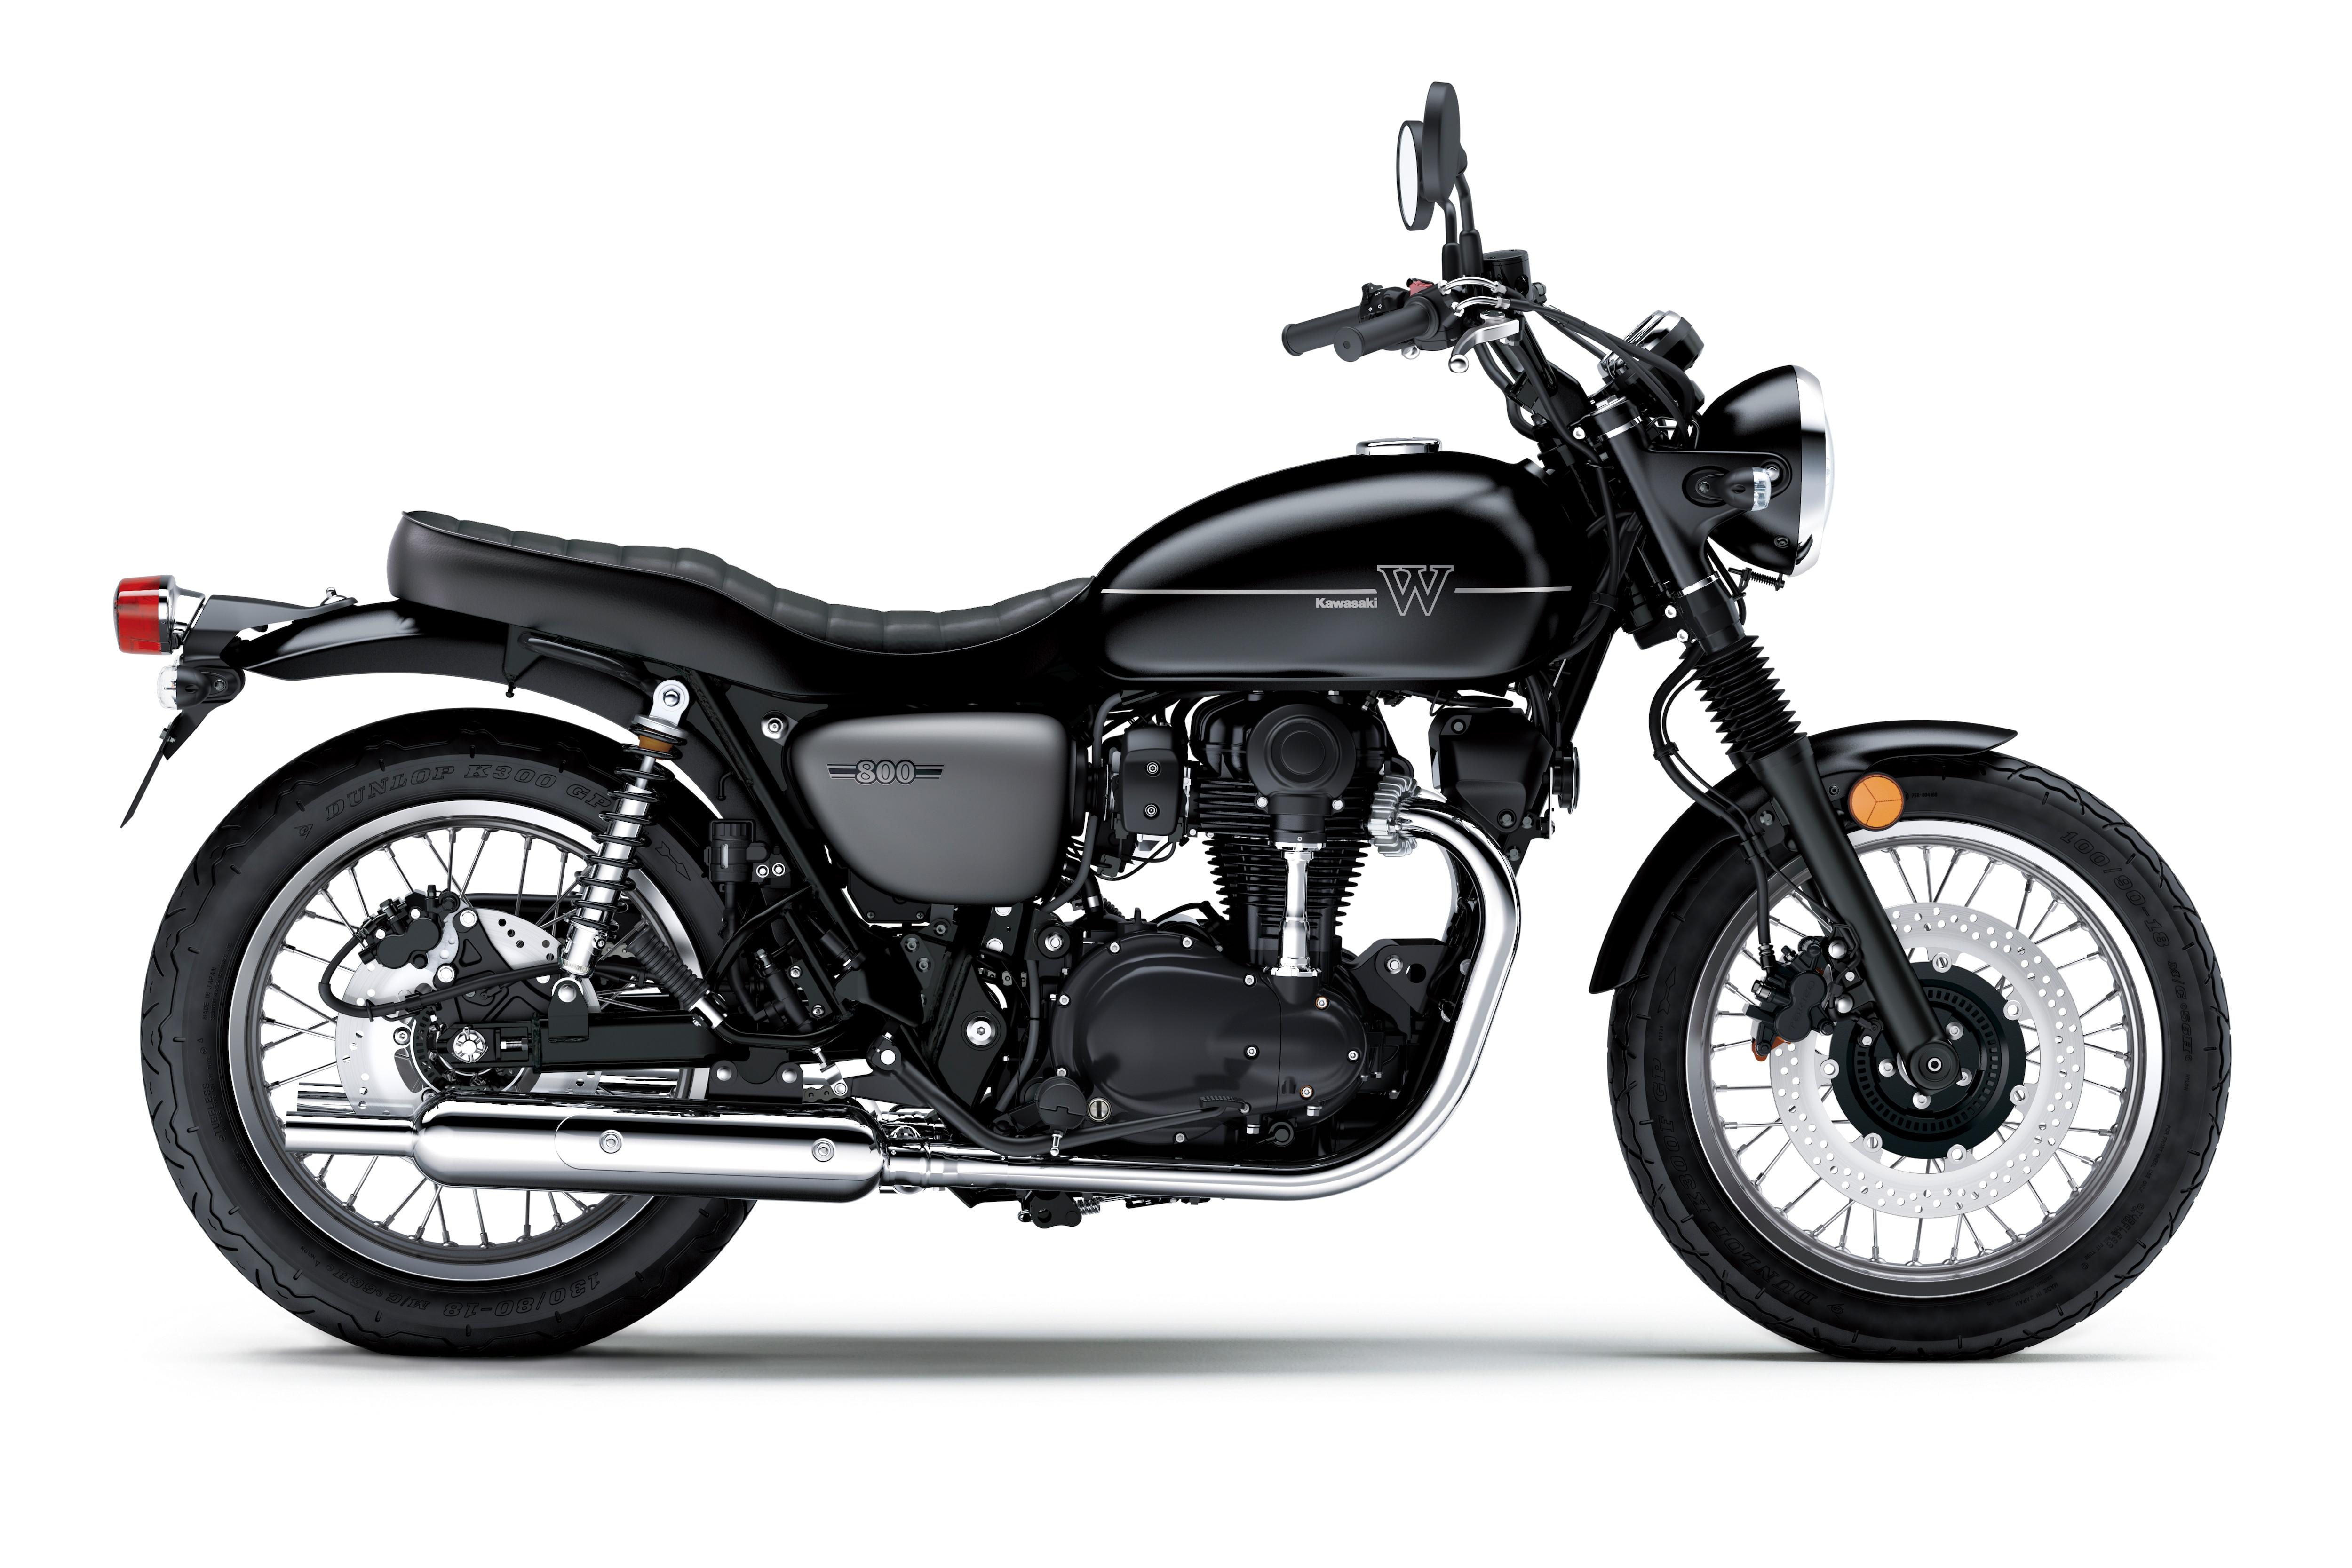 Kawasaki Launches W800 Street Retro Motorcycle In India